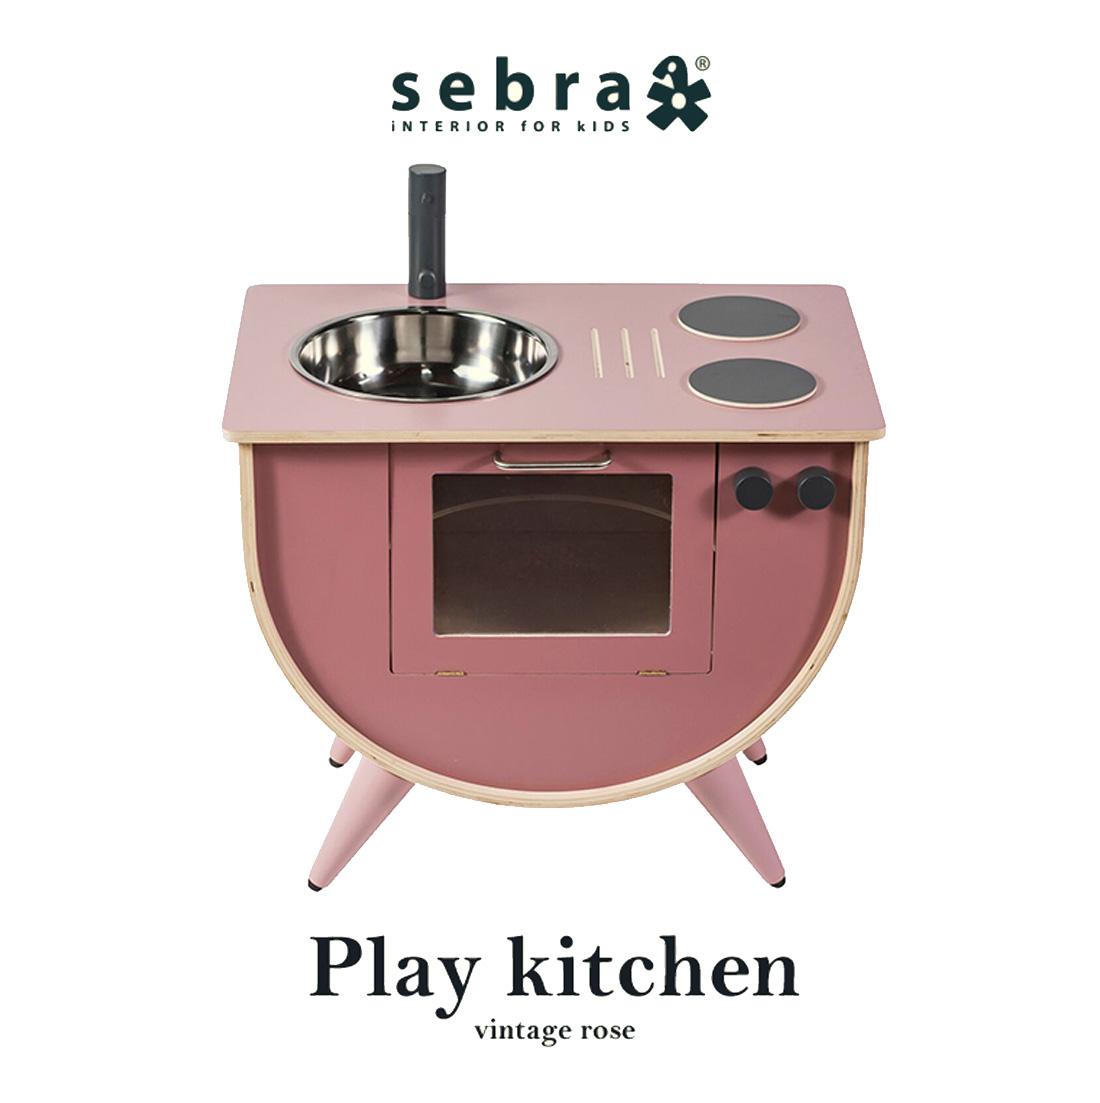 【sebra セバ】ままごとキッチン RoMia Dela ミアデラ  子供用家具 子ども キッズ デンマーク 北欧 子供用 玩具